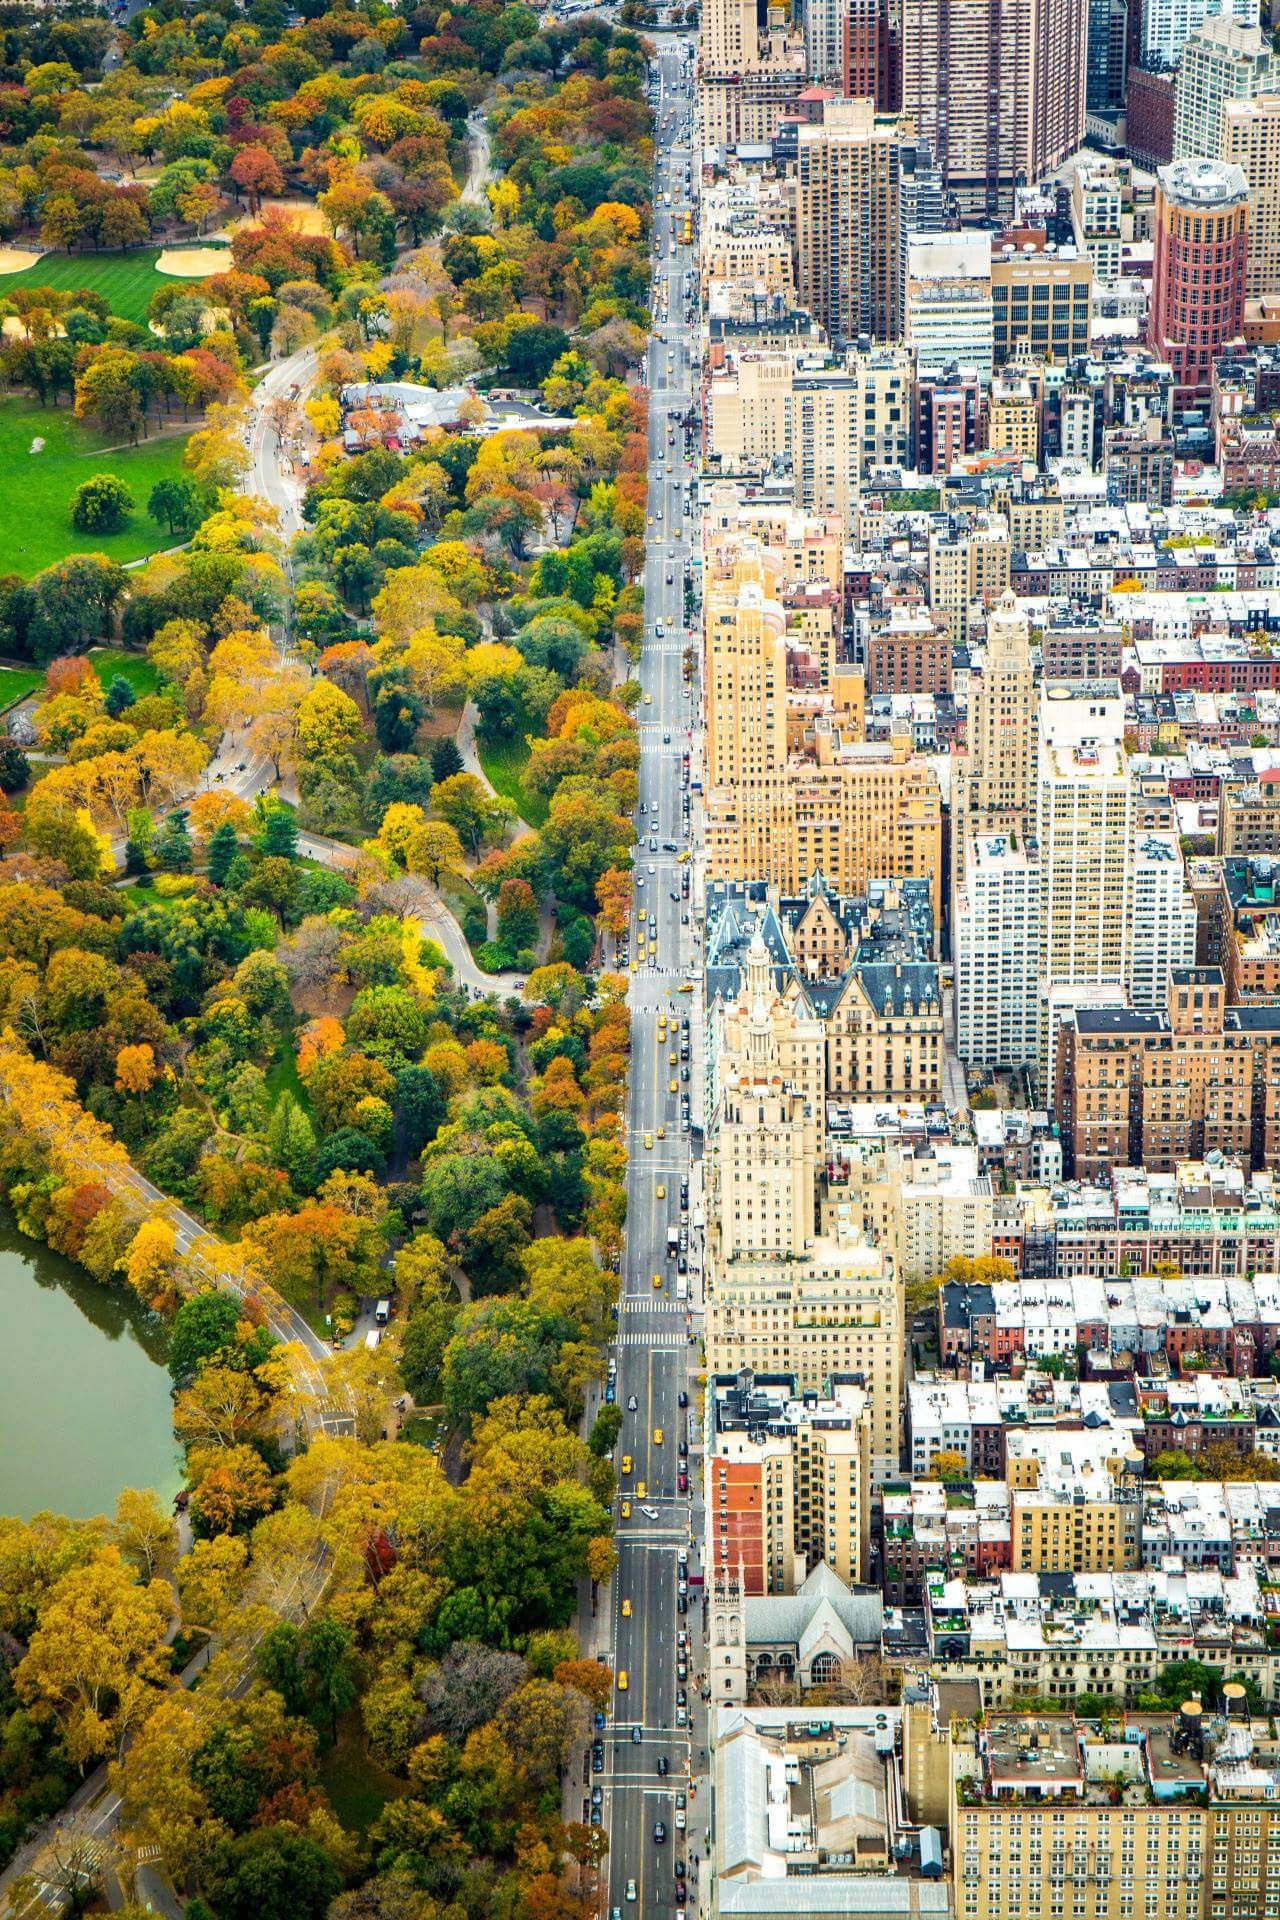 Central Park, N.Y.